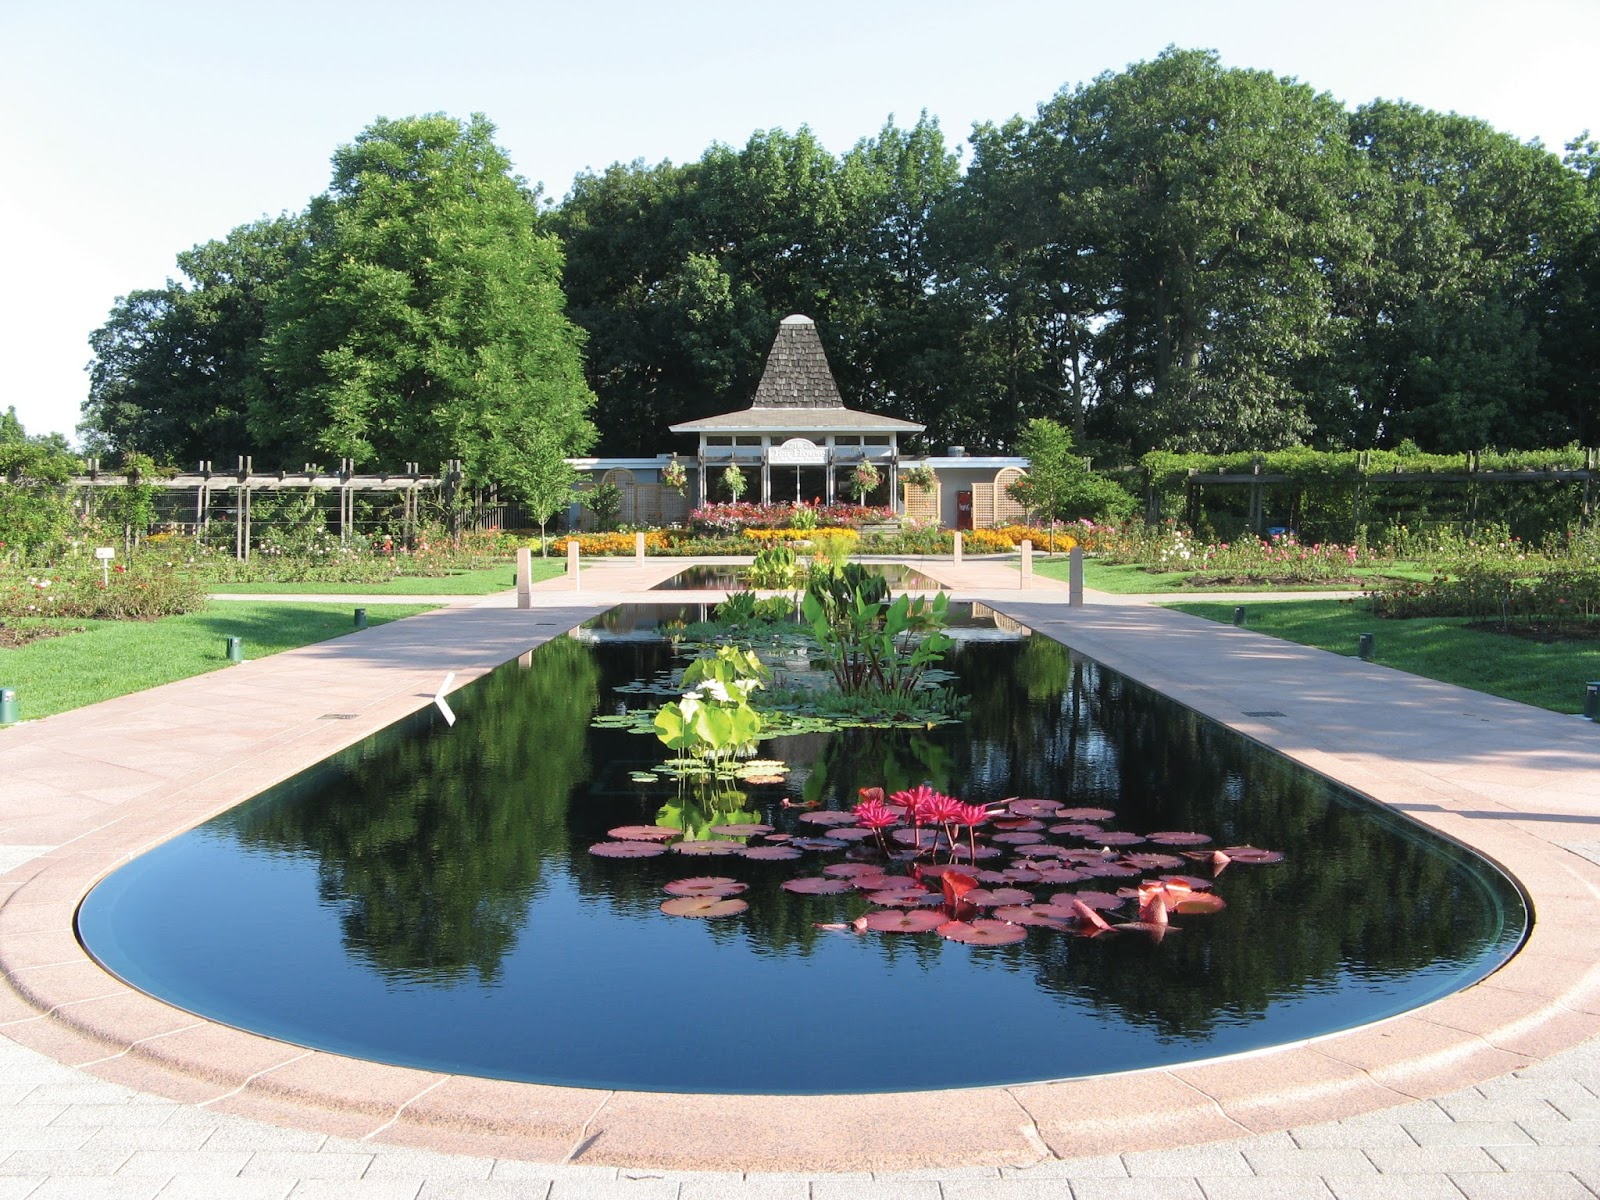 The Royal Botanical Gardens (Burlington) A Weekend Garden Getaway